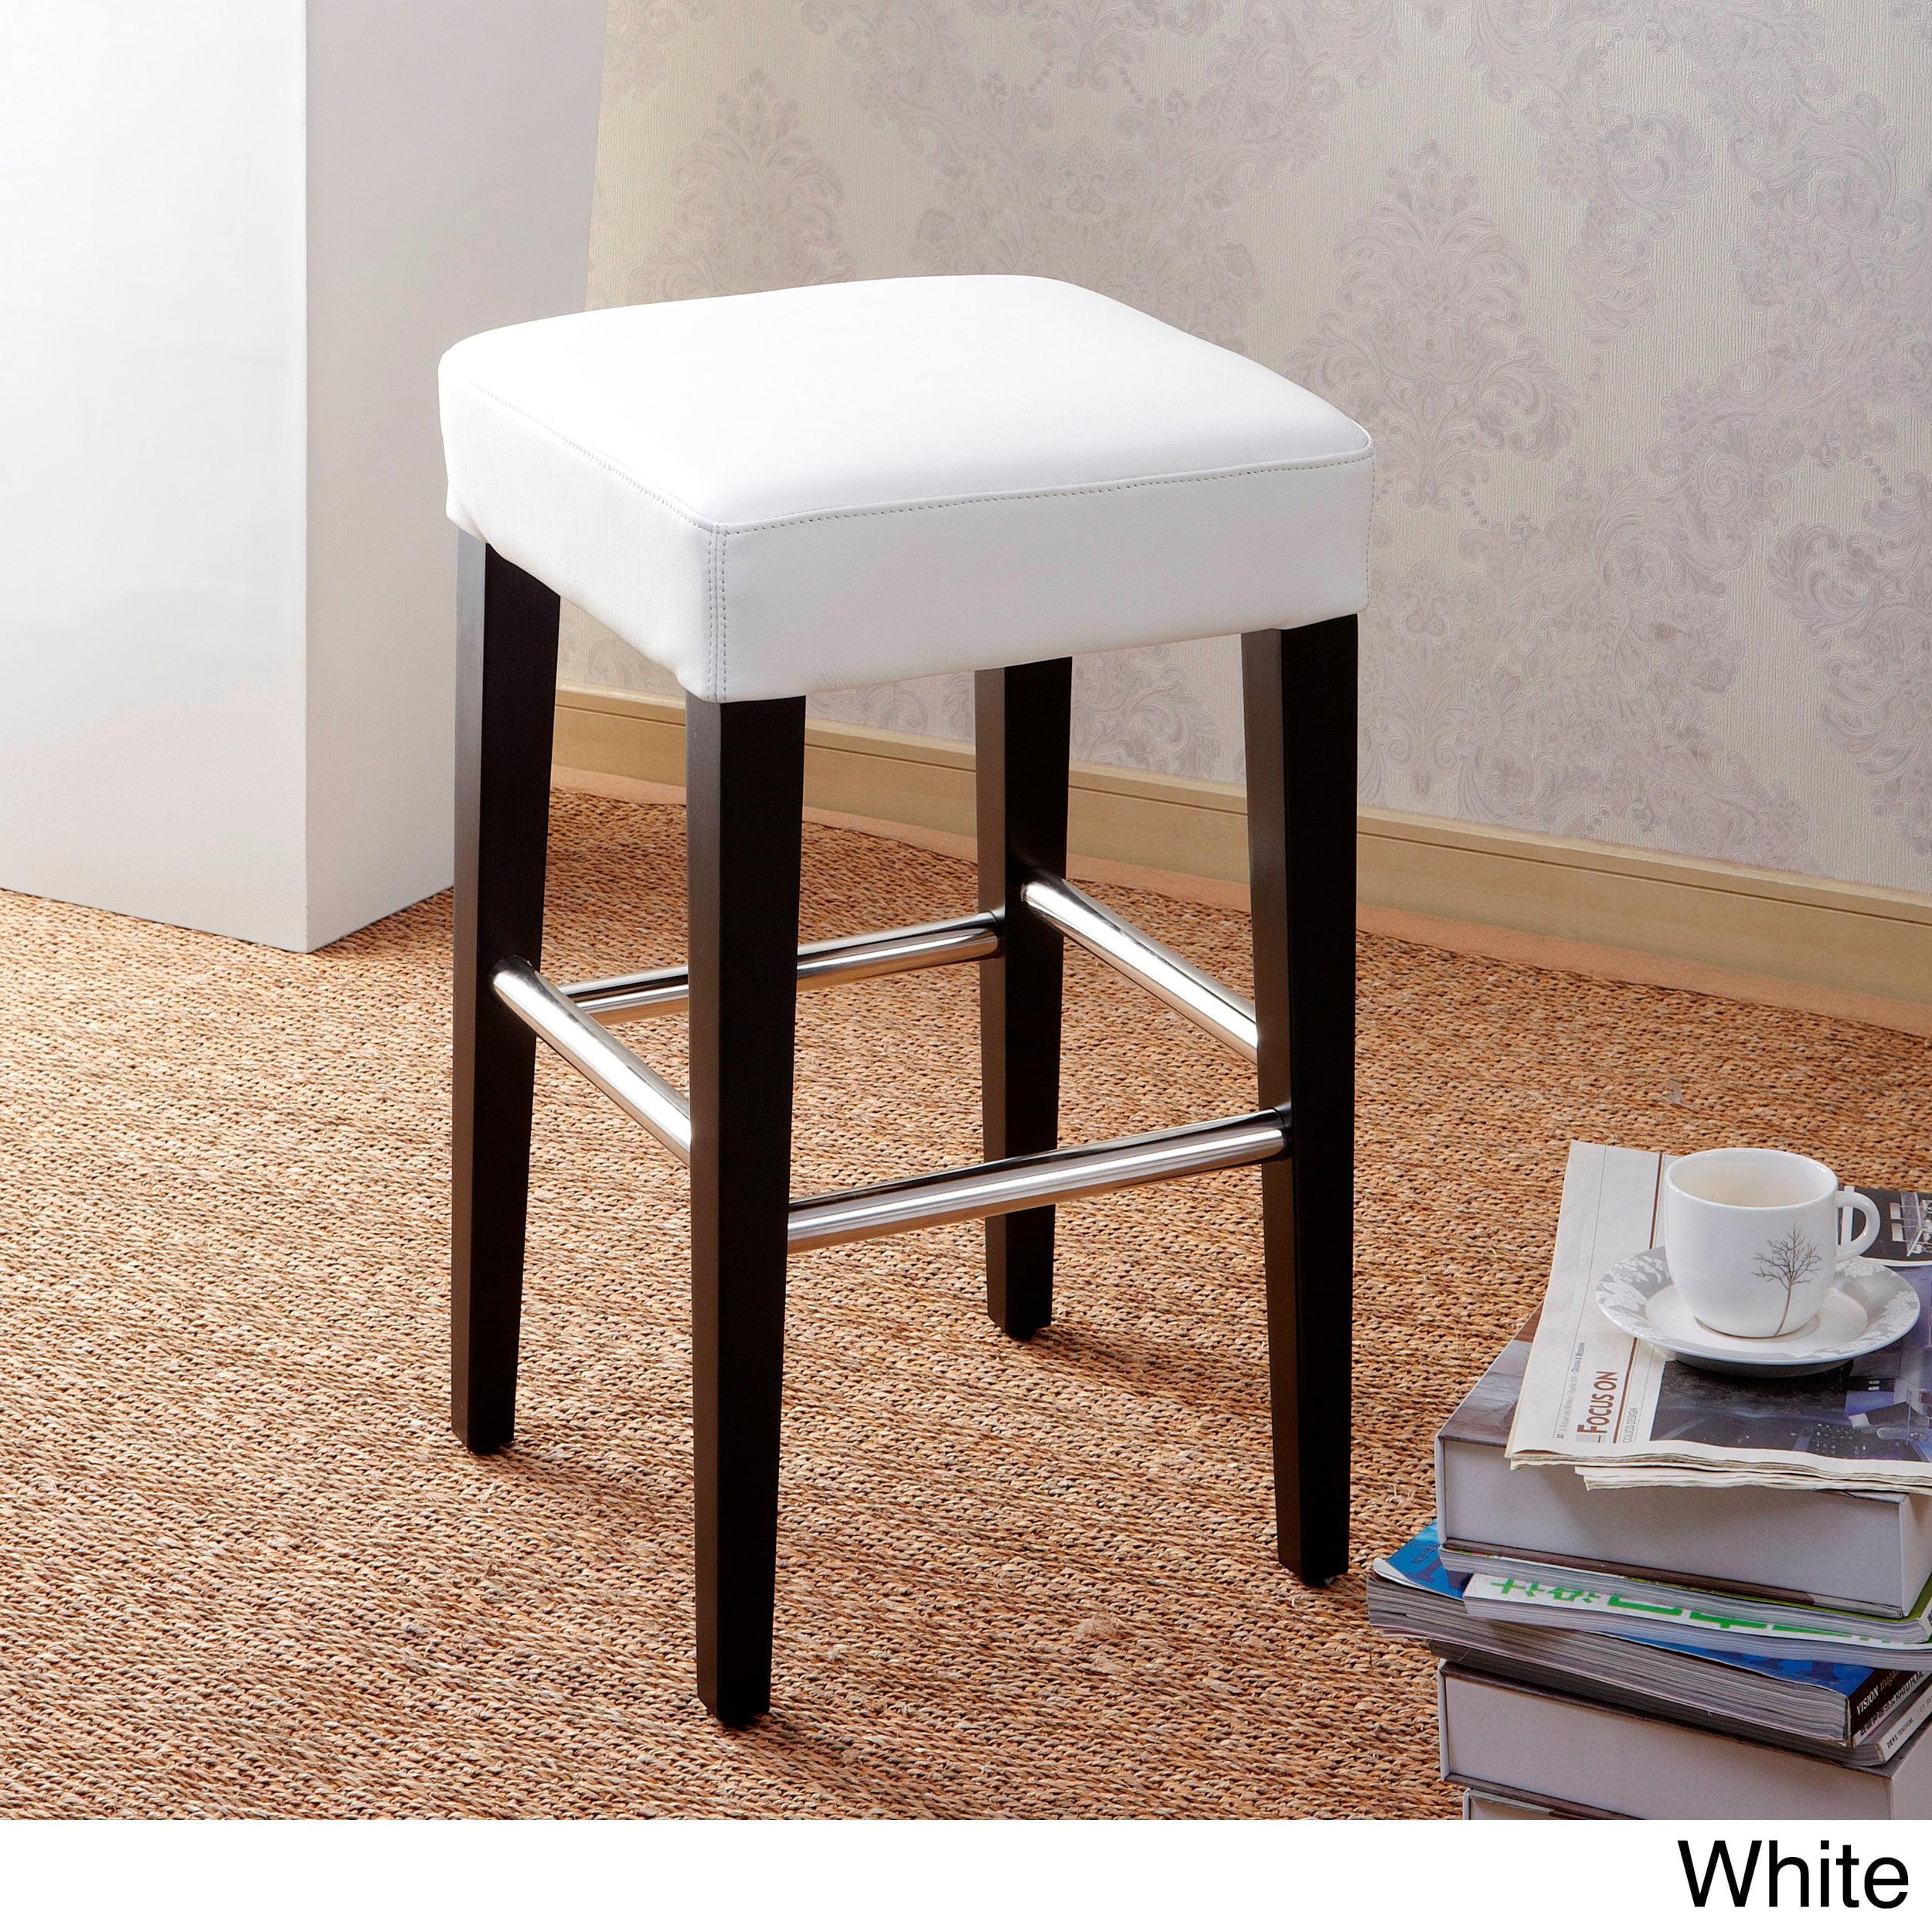 Strange Cortesi Home Boulder Counter Stool In Genuine Leather With Black Legs Merlot Lamtechconsult Wood Chair Design Ideas Lamtechconsultcom